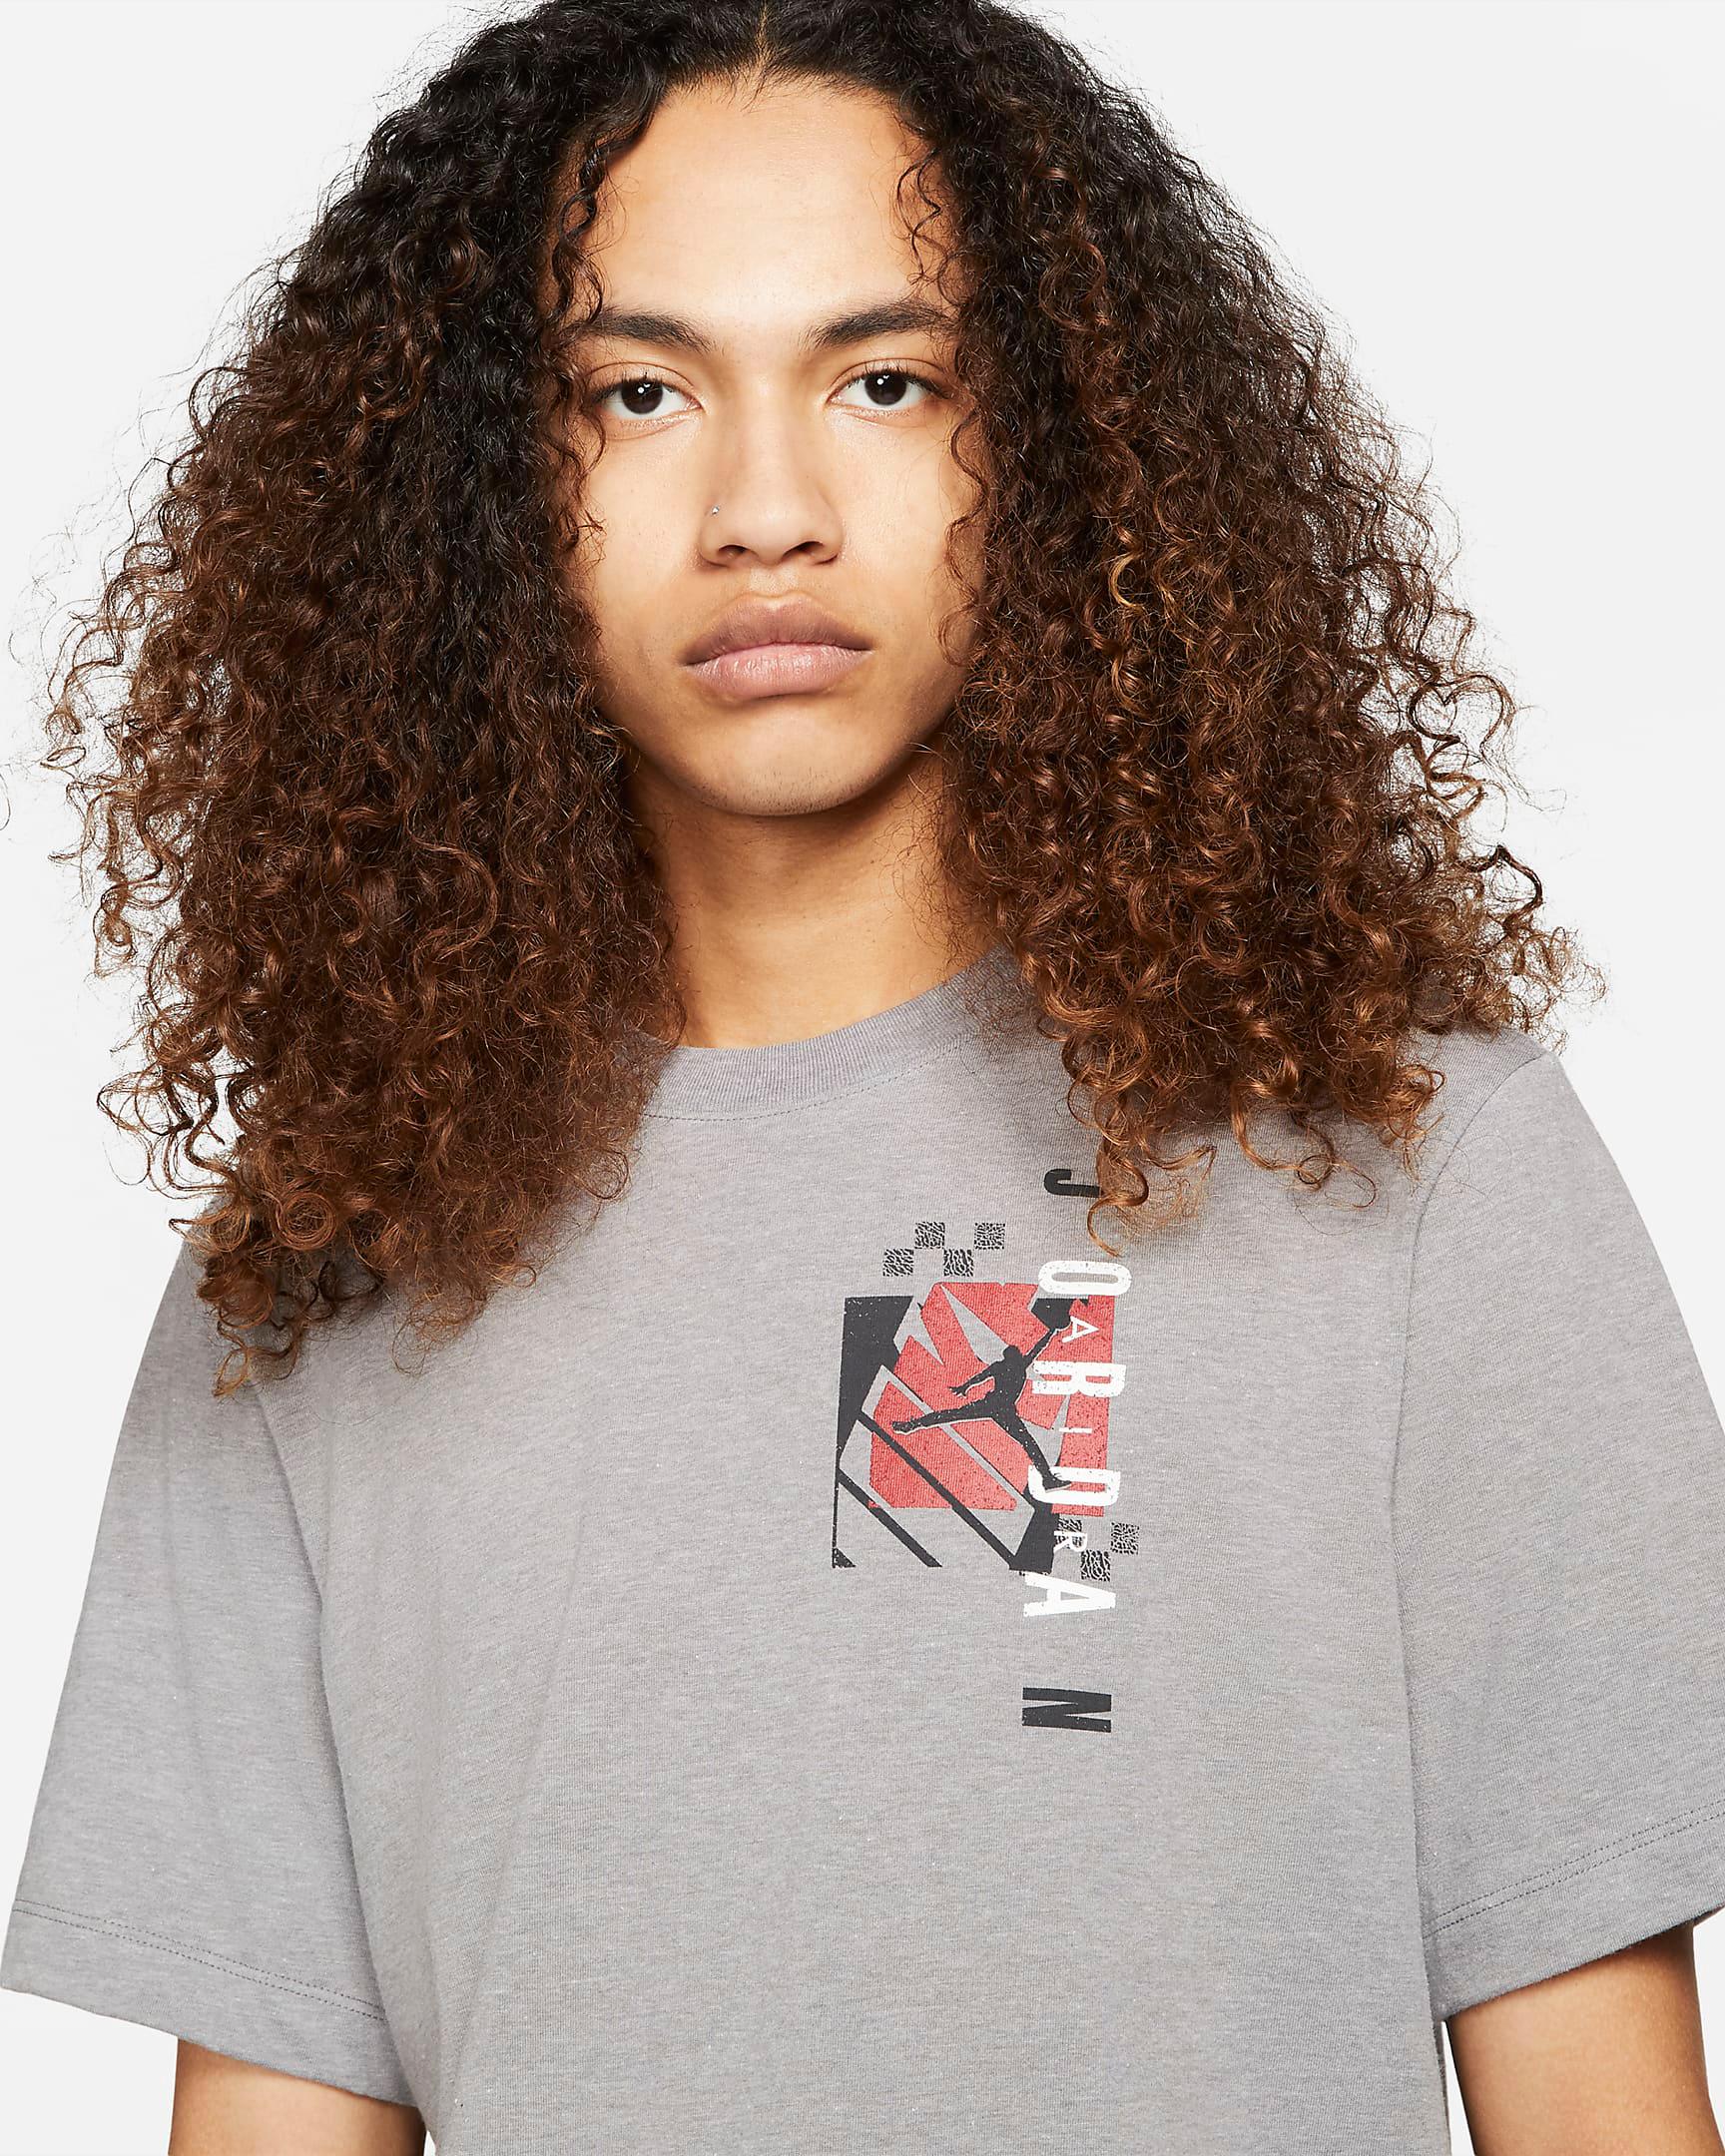 jordan-air-futura-shirt-grey-black-red-summer-2021-1